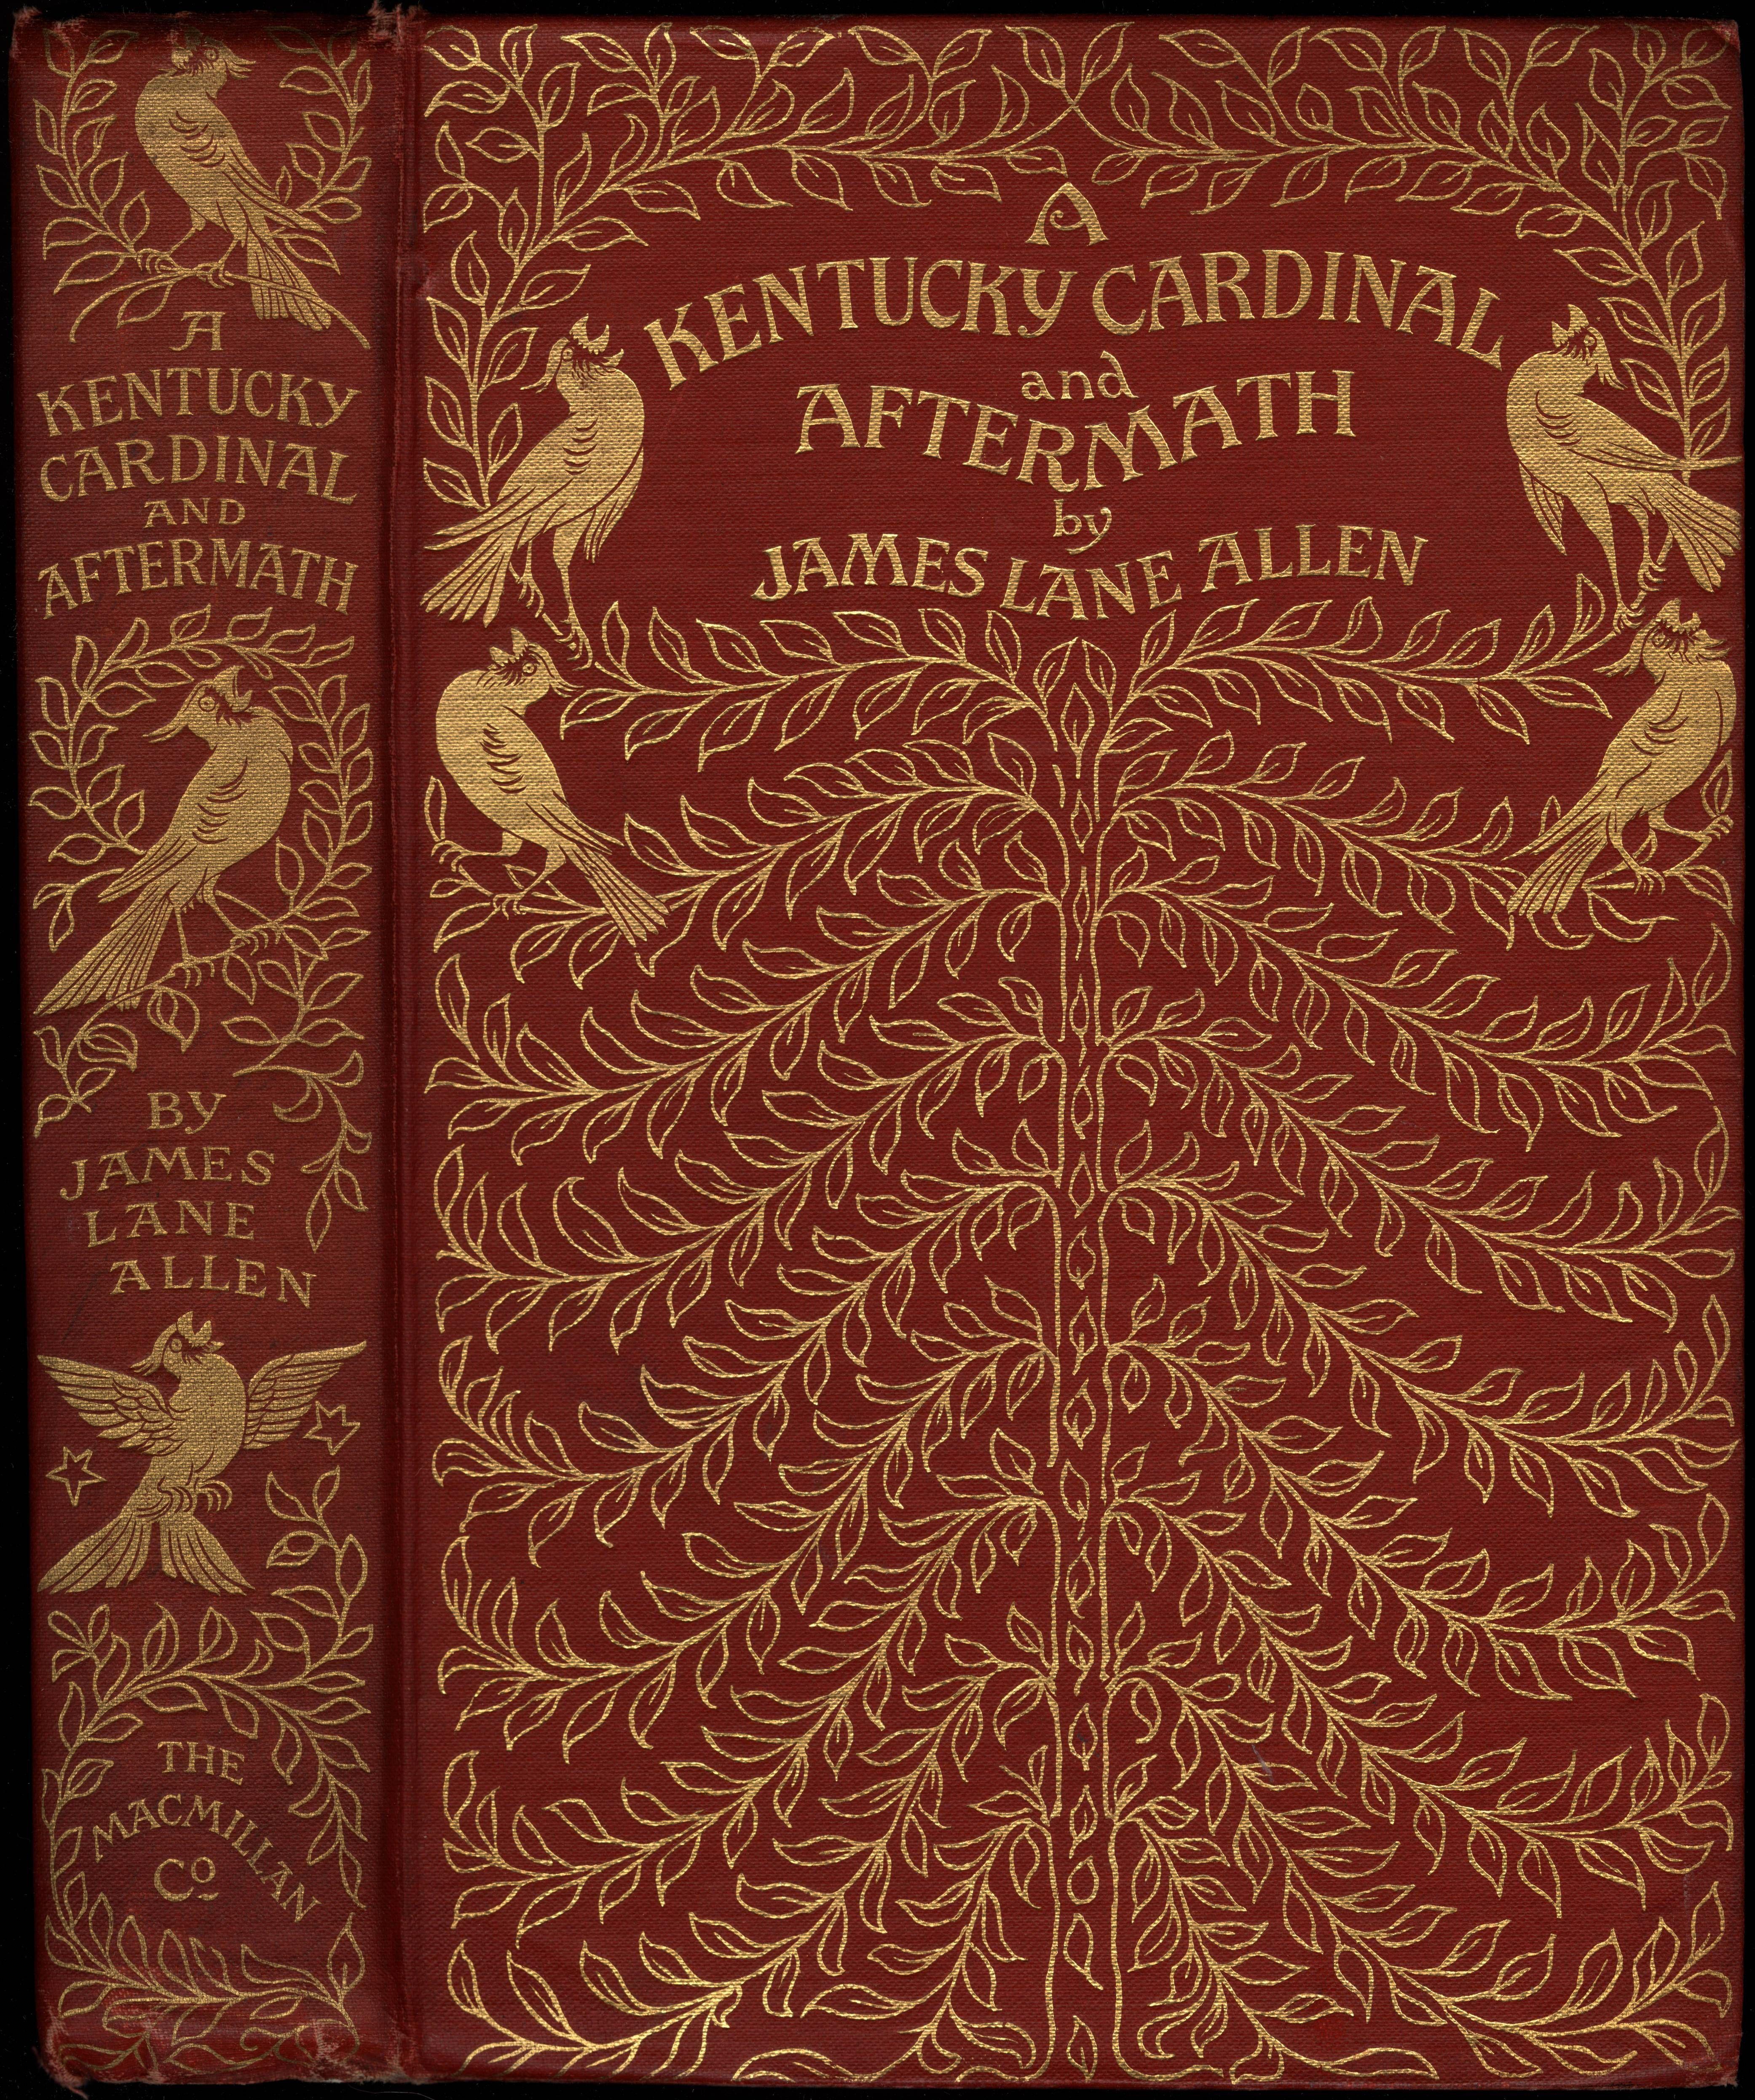 Historical book photo